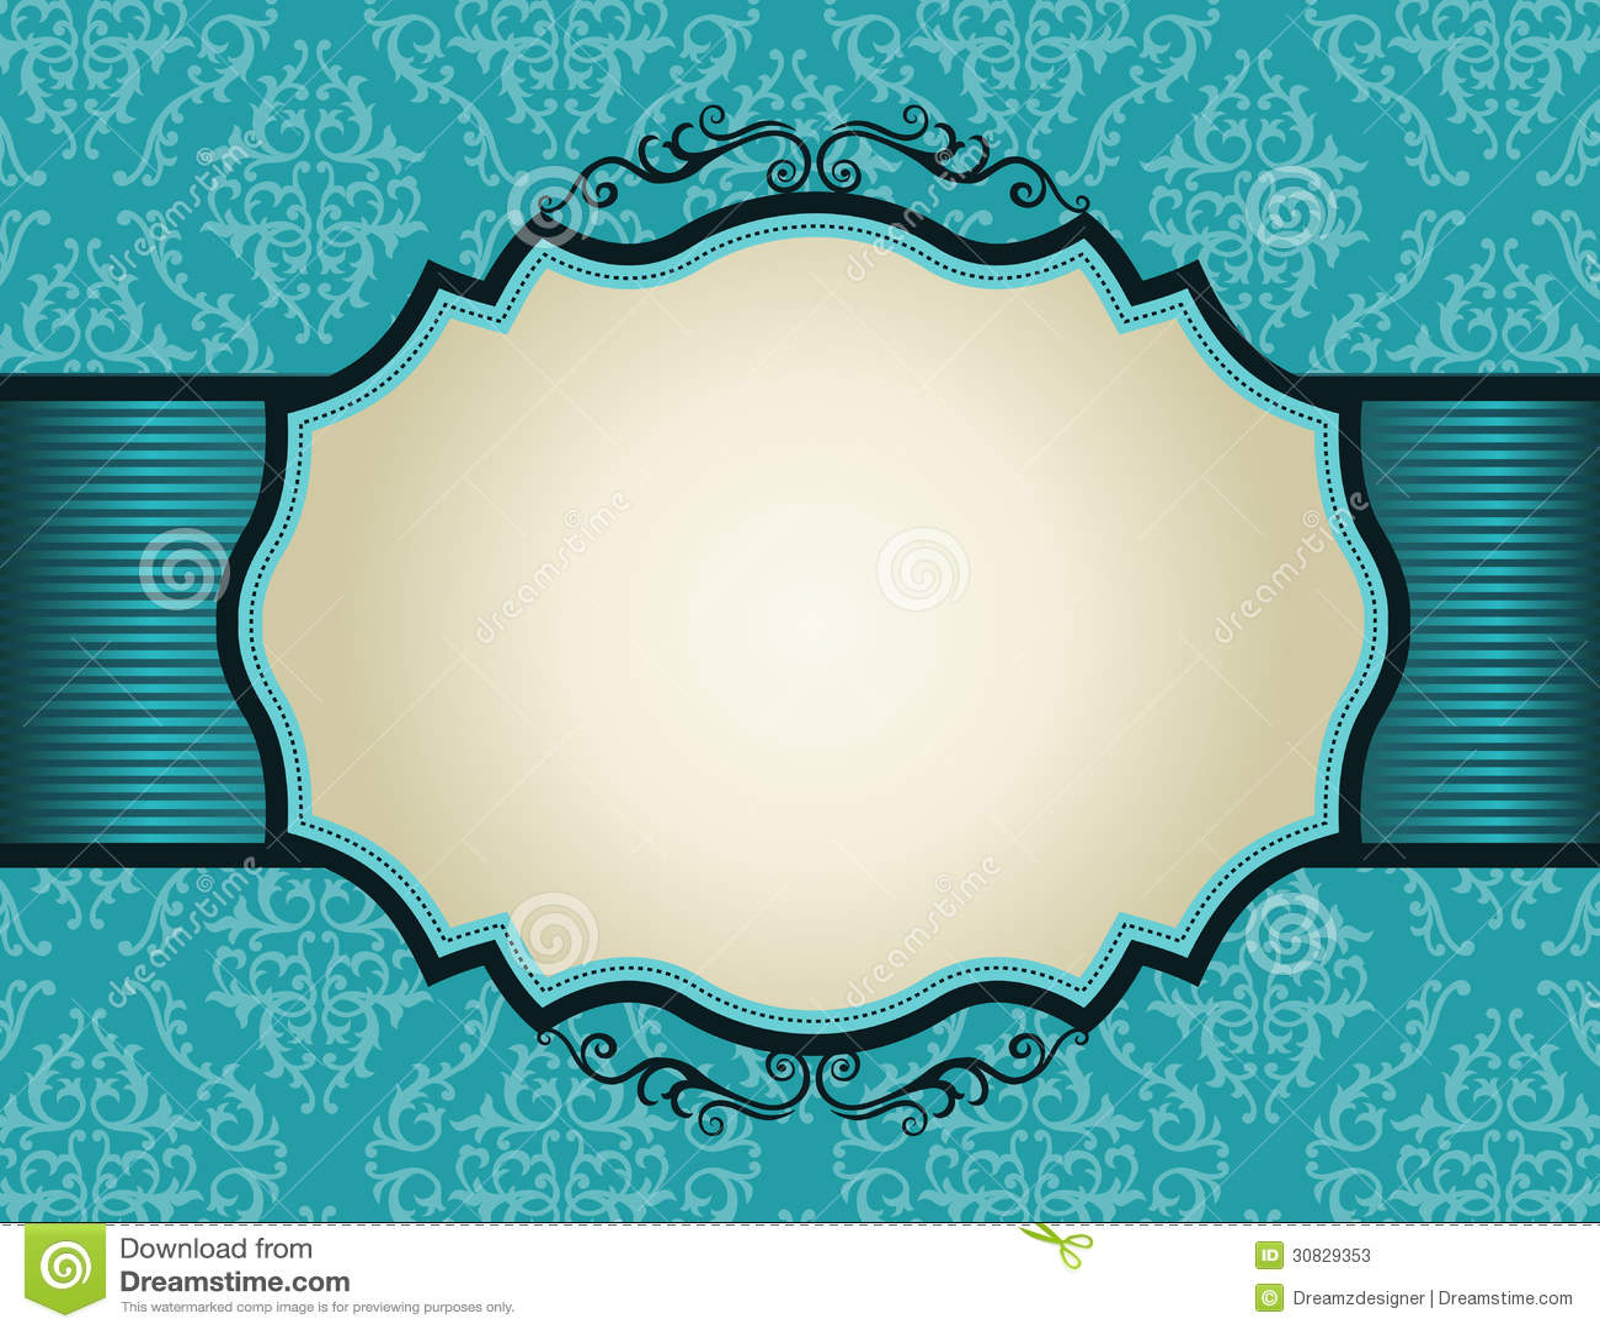 Retro Invitation Frame On Damask Pattern Backgroun Stock Photos - Image: 30829353